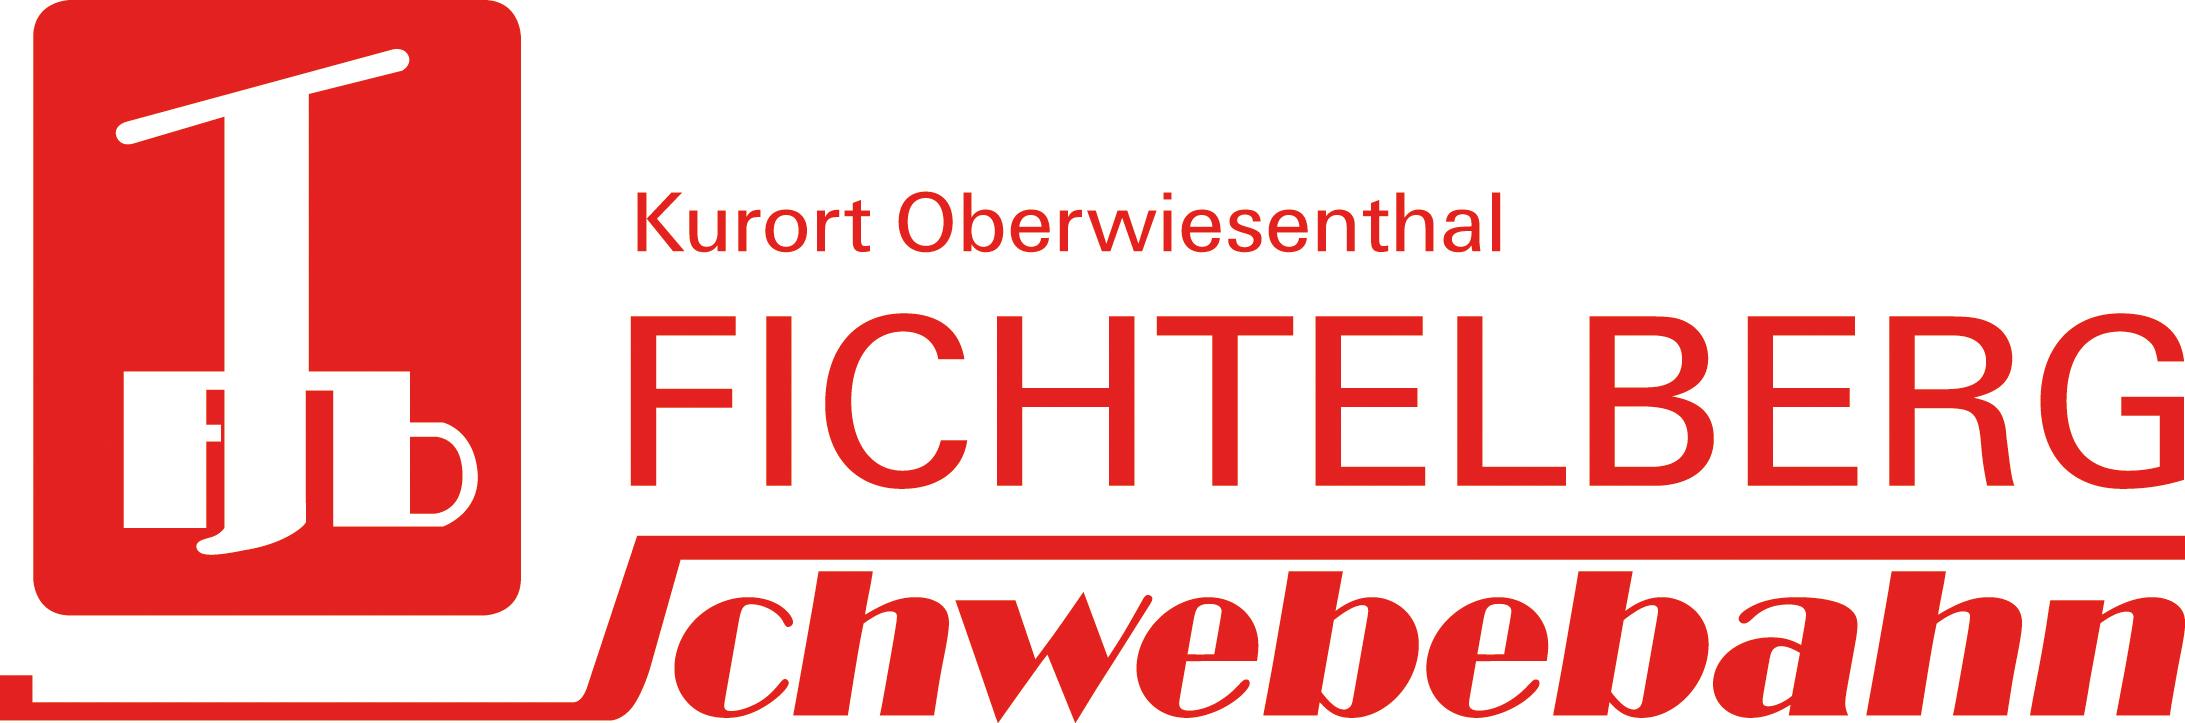 Oberwiesenthal/Fichtelberg - Logo